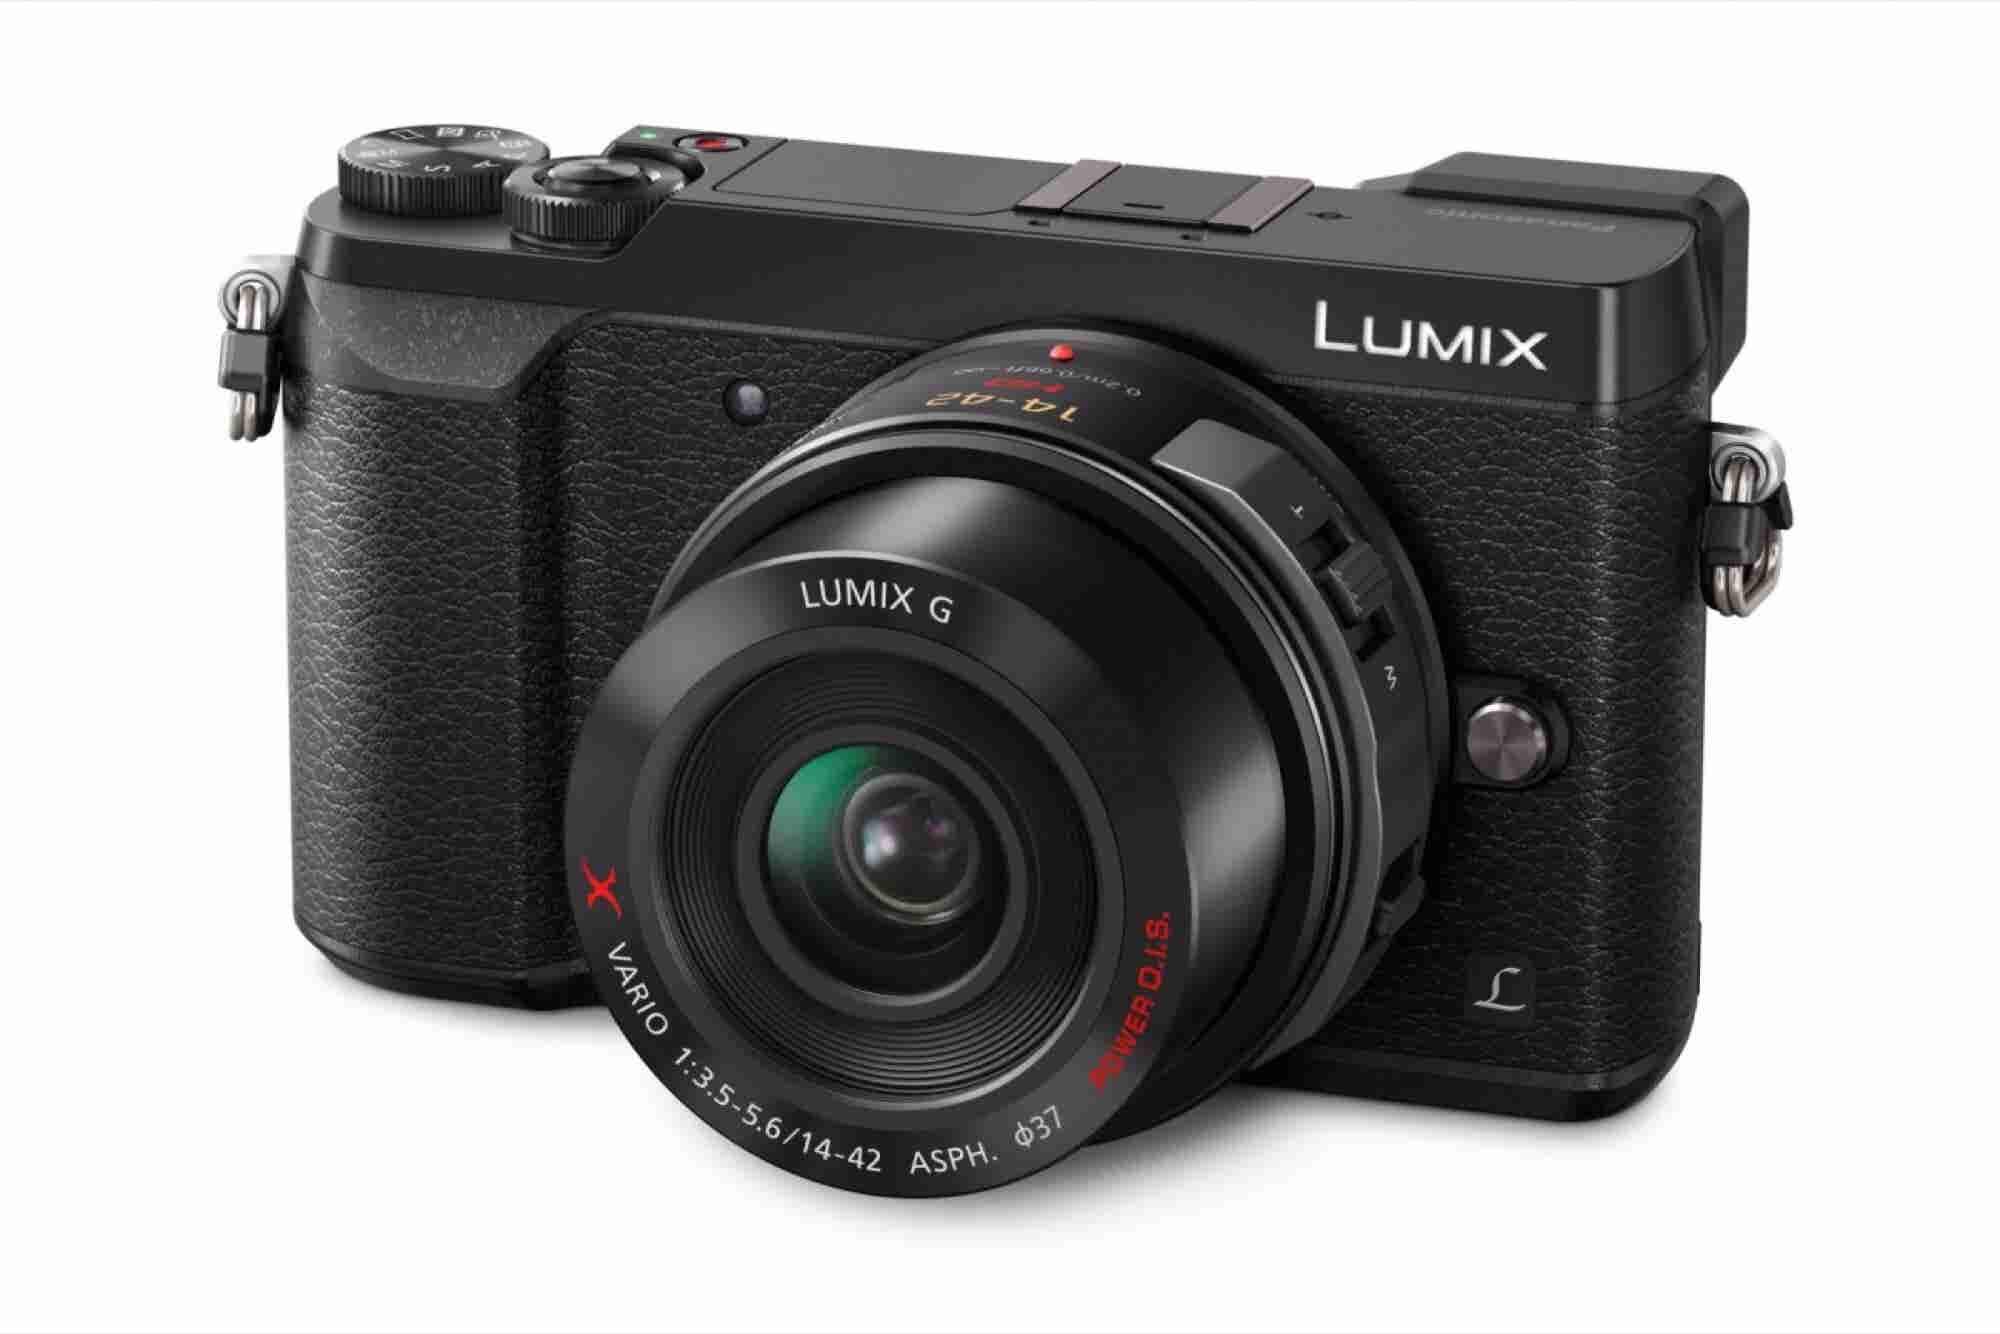 Picture This: Panasonic Launches LUMIX GX85